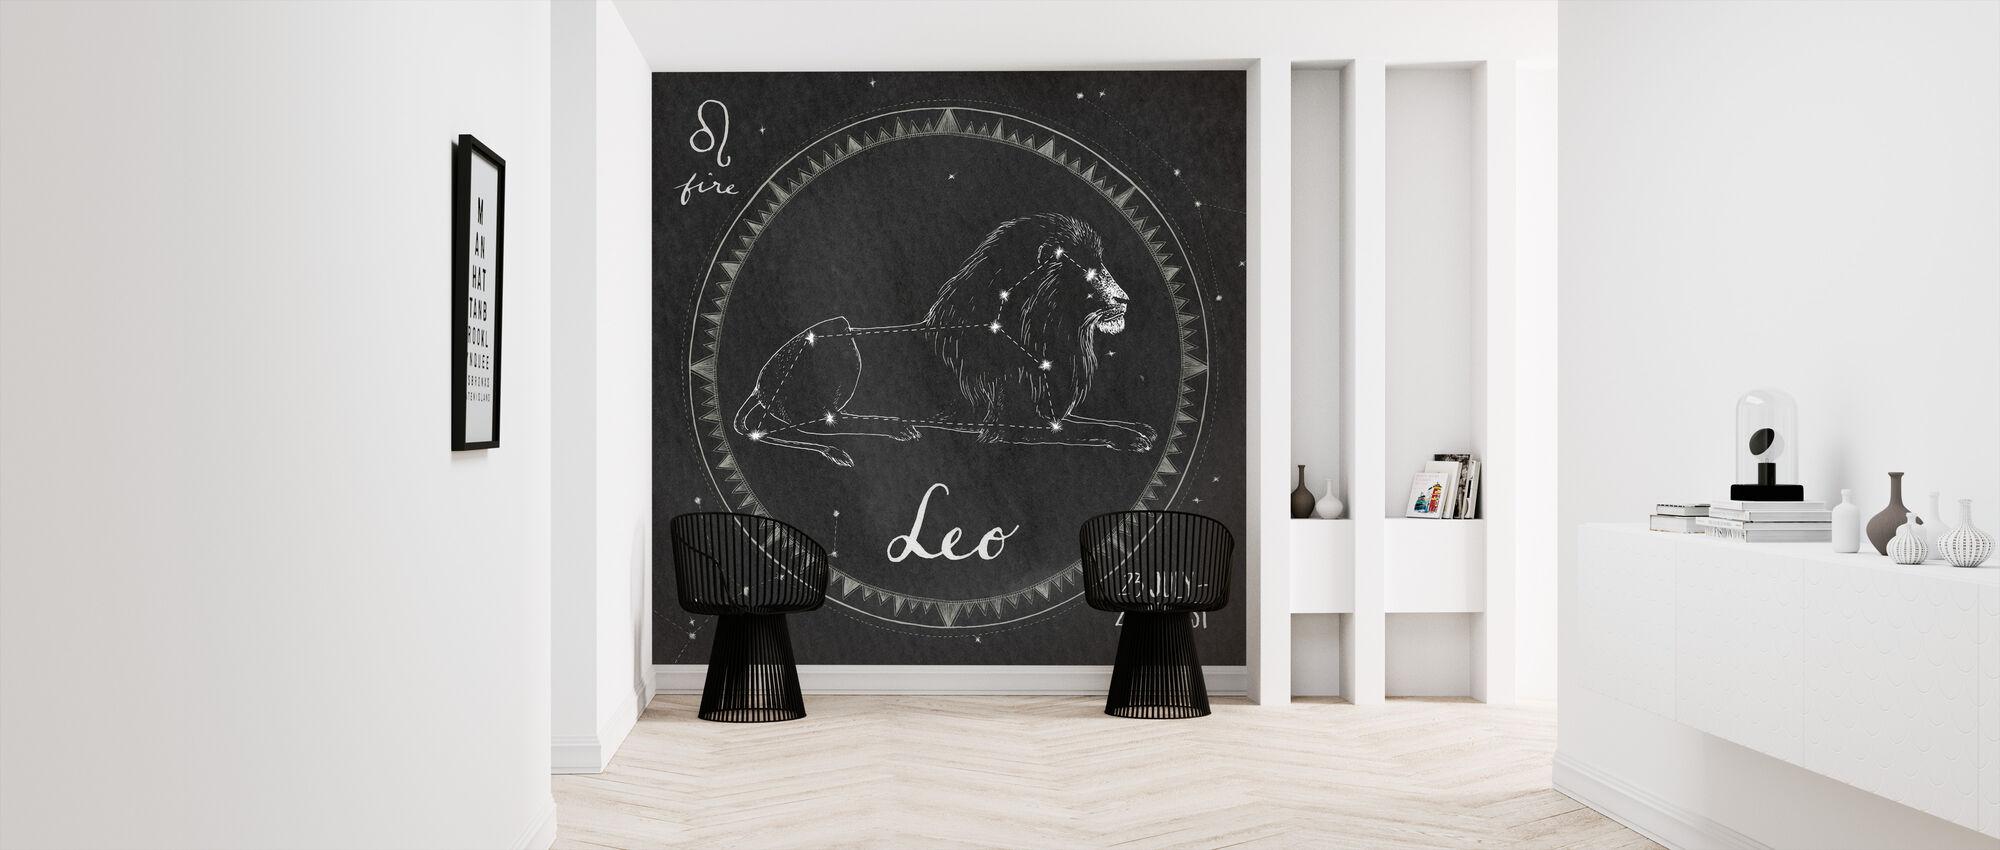 Night Sky Leo - Wallpaper - Hallway